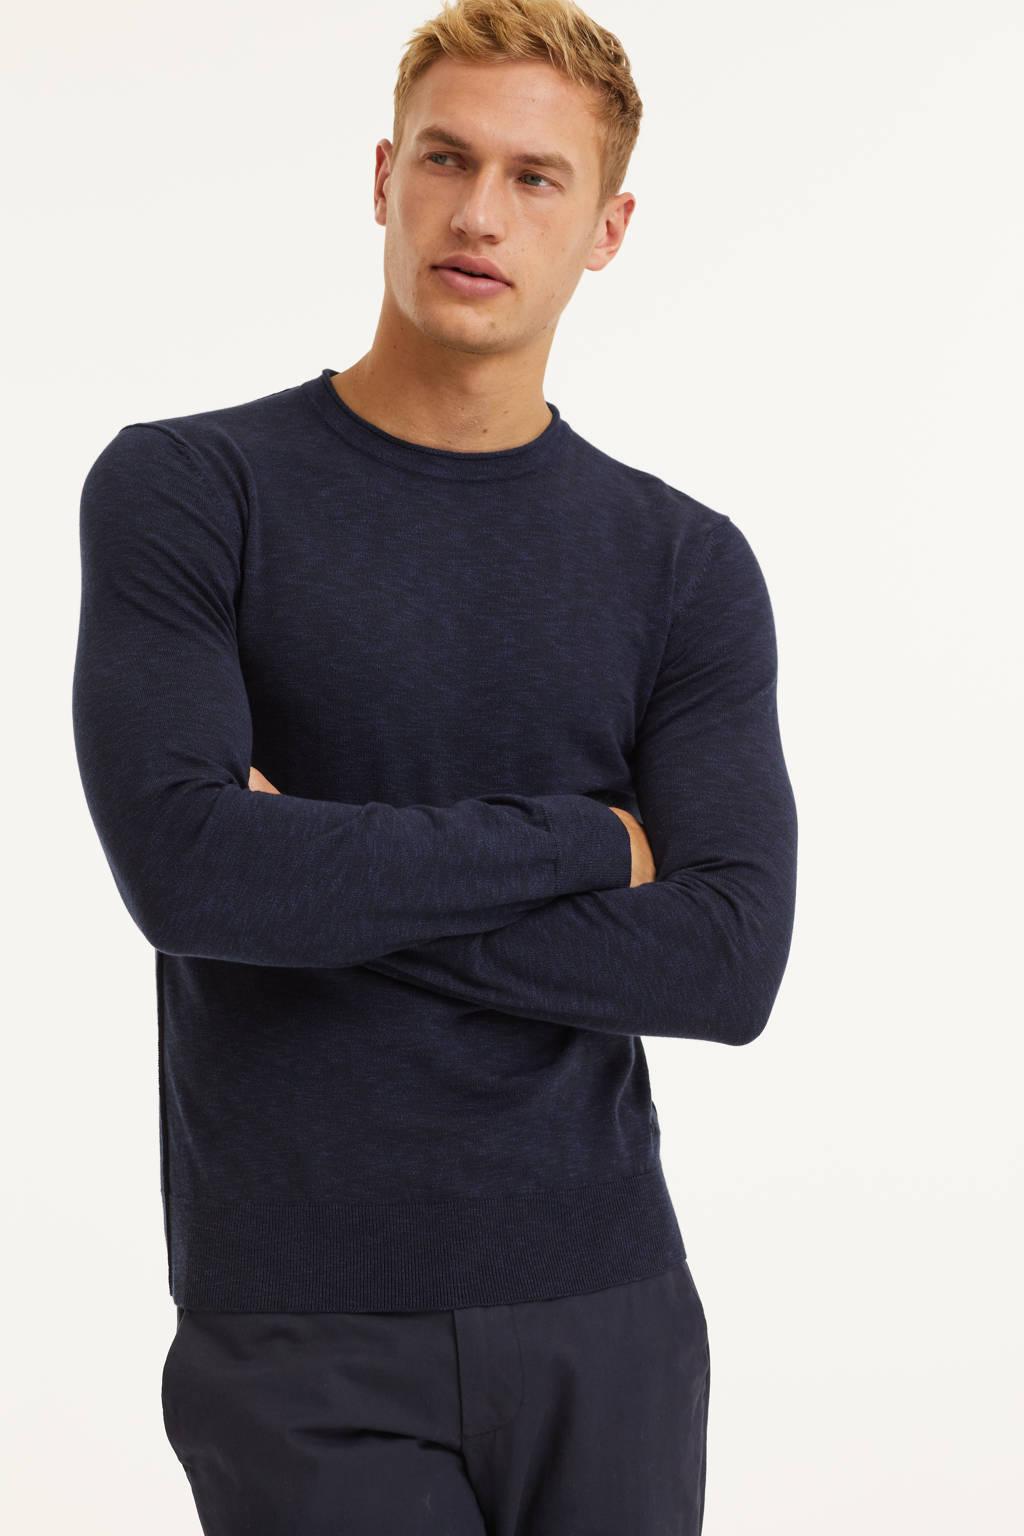 BOSS Casual gemêleerde trui Kamnioda donkerblauw, Donkerblauw